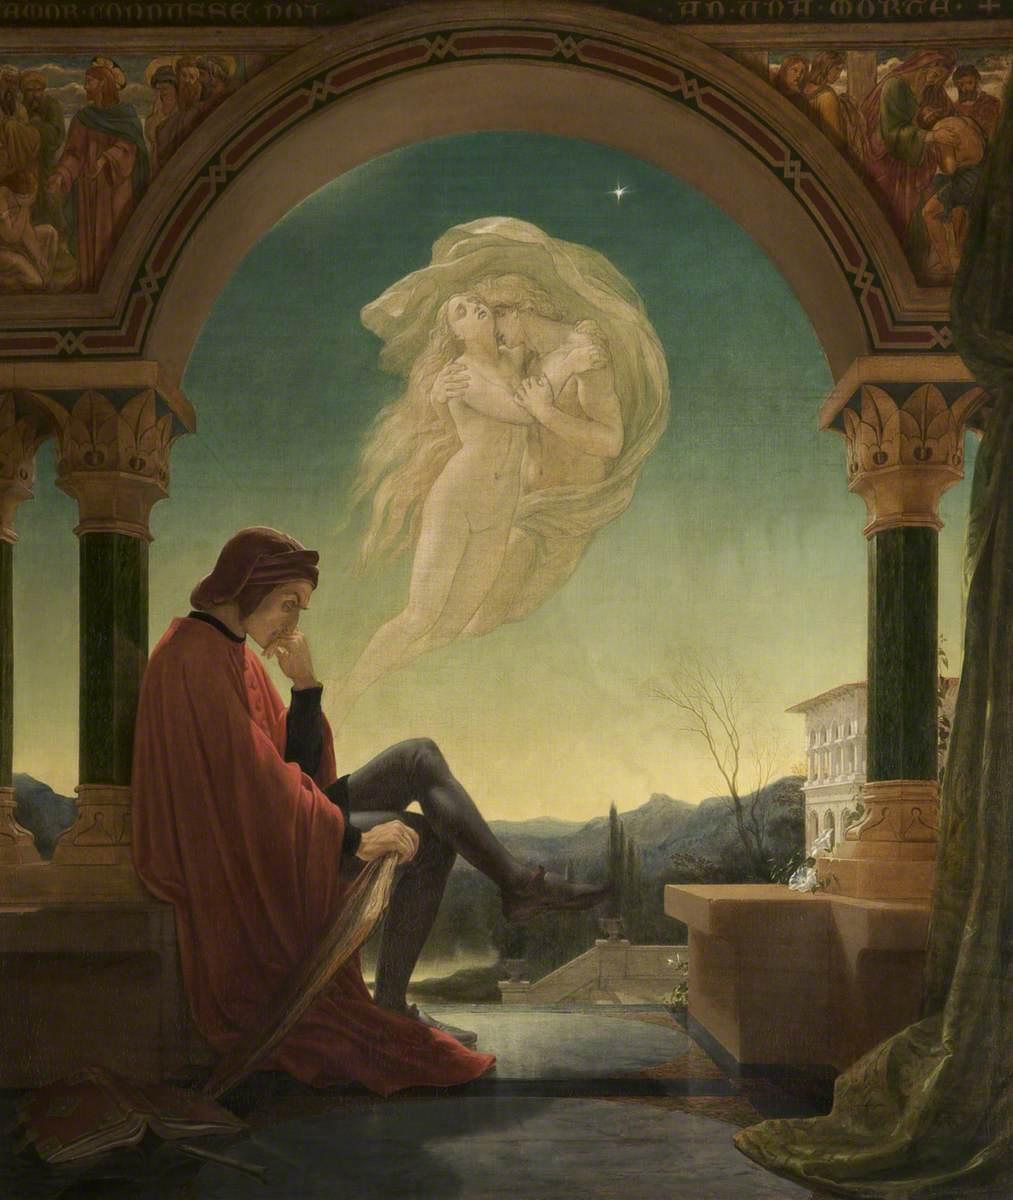 Dante Meditating the Episode of Francesca da Rimini and Paolo Malatesta